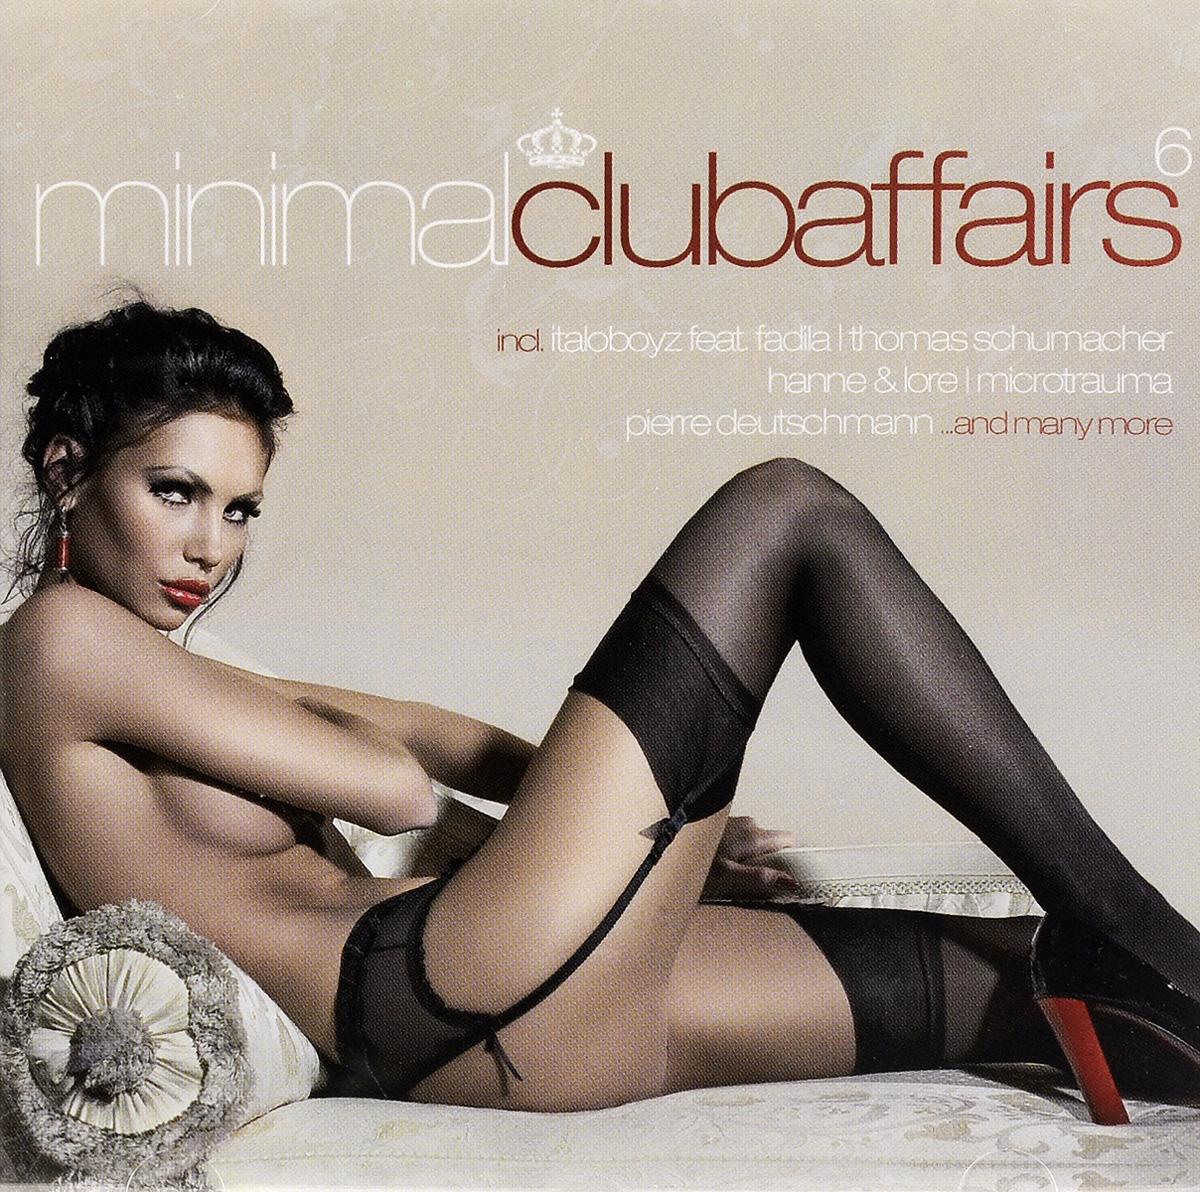 Фото - Minimal Club Affairs. Vol. 6 (2 CD) minimal house 2 cd